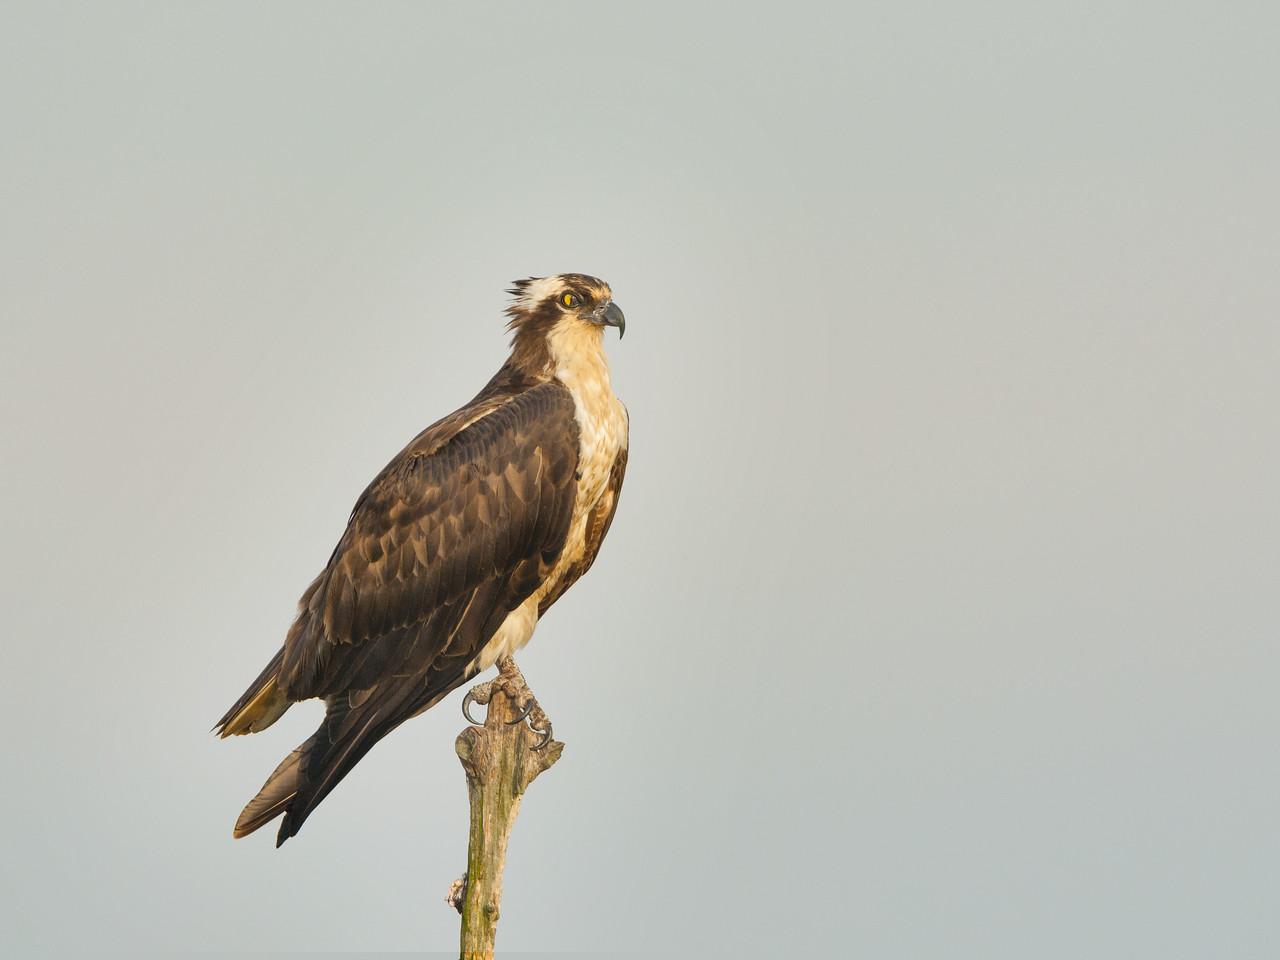 Osprey Perched in a Snag